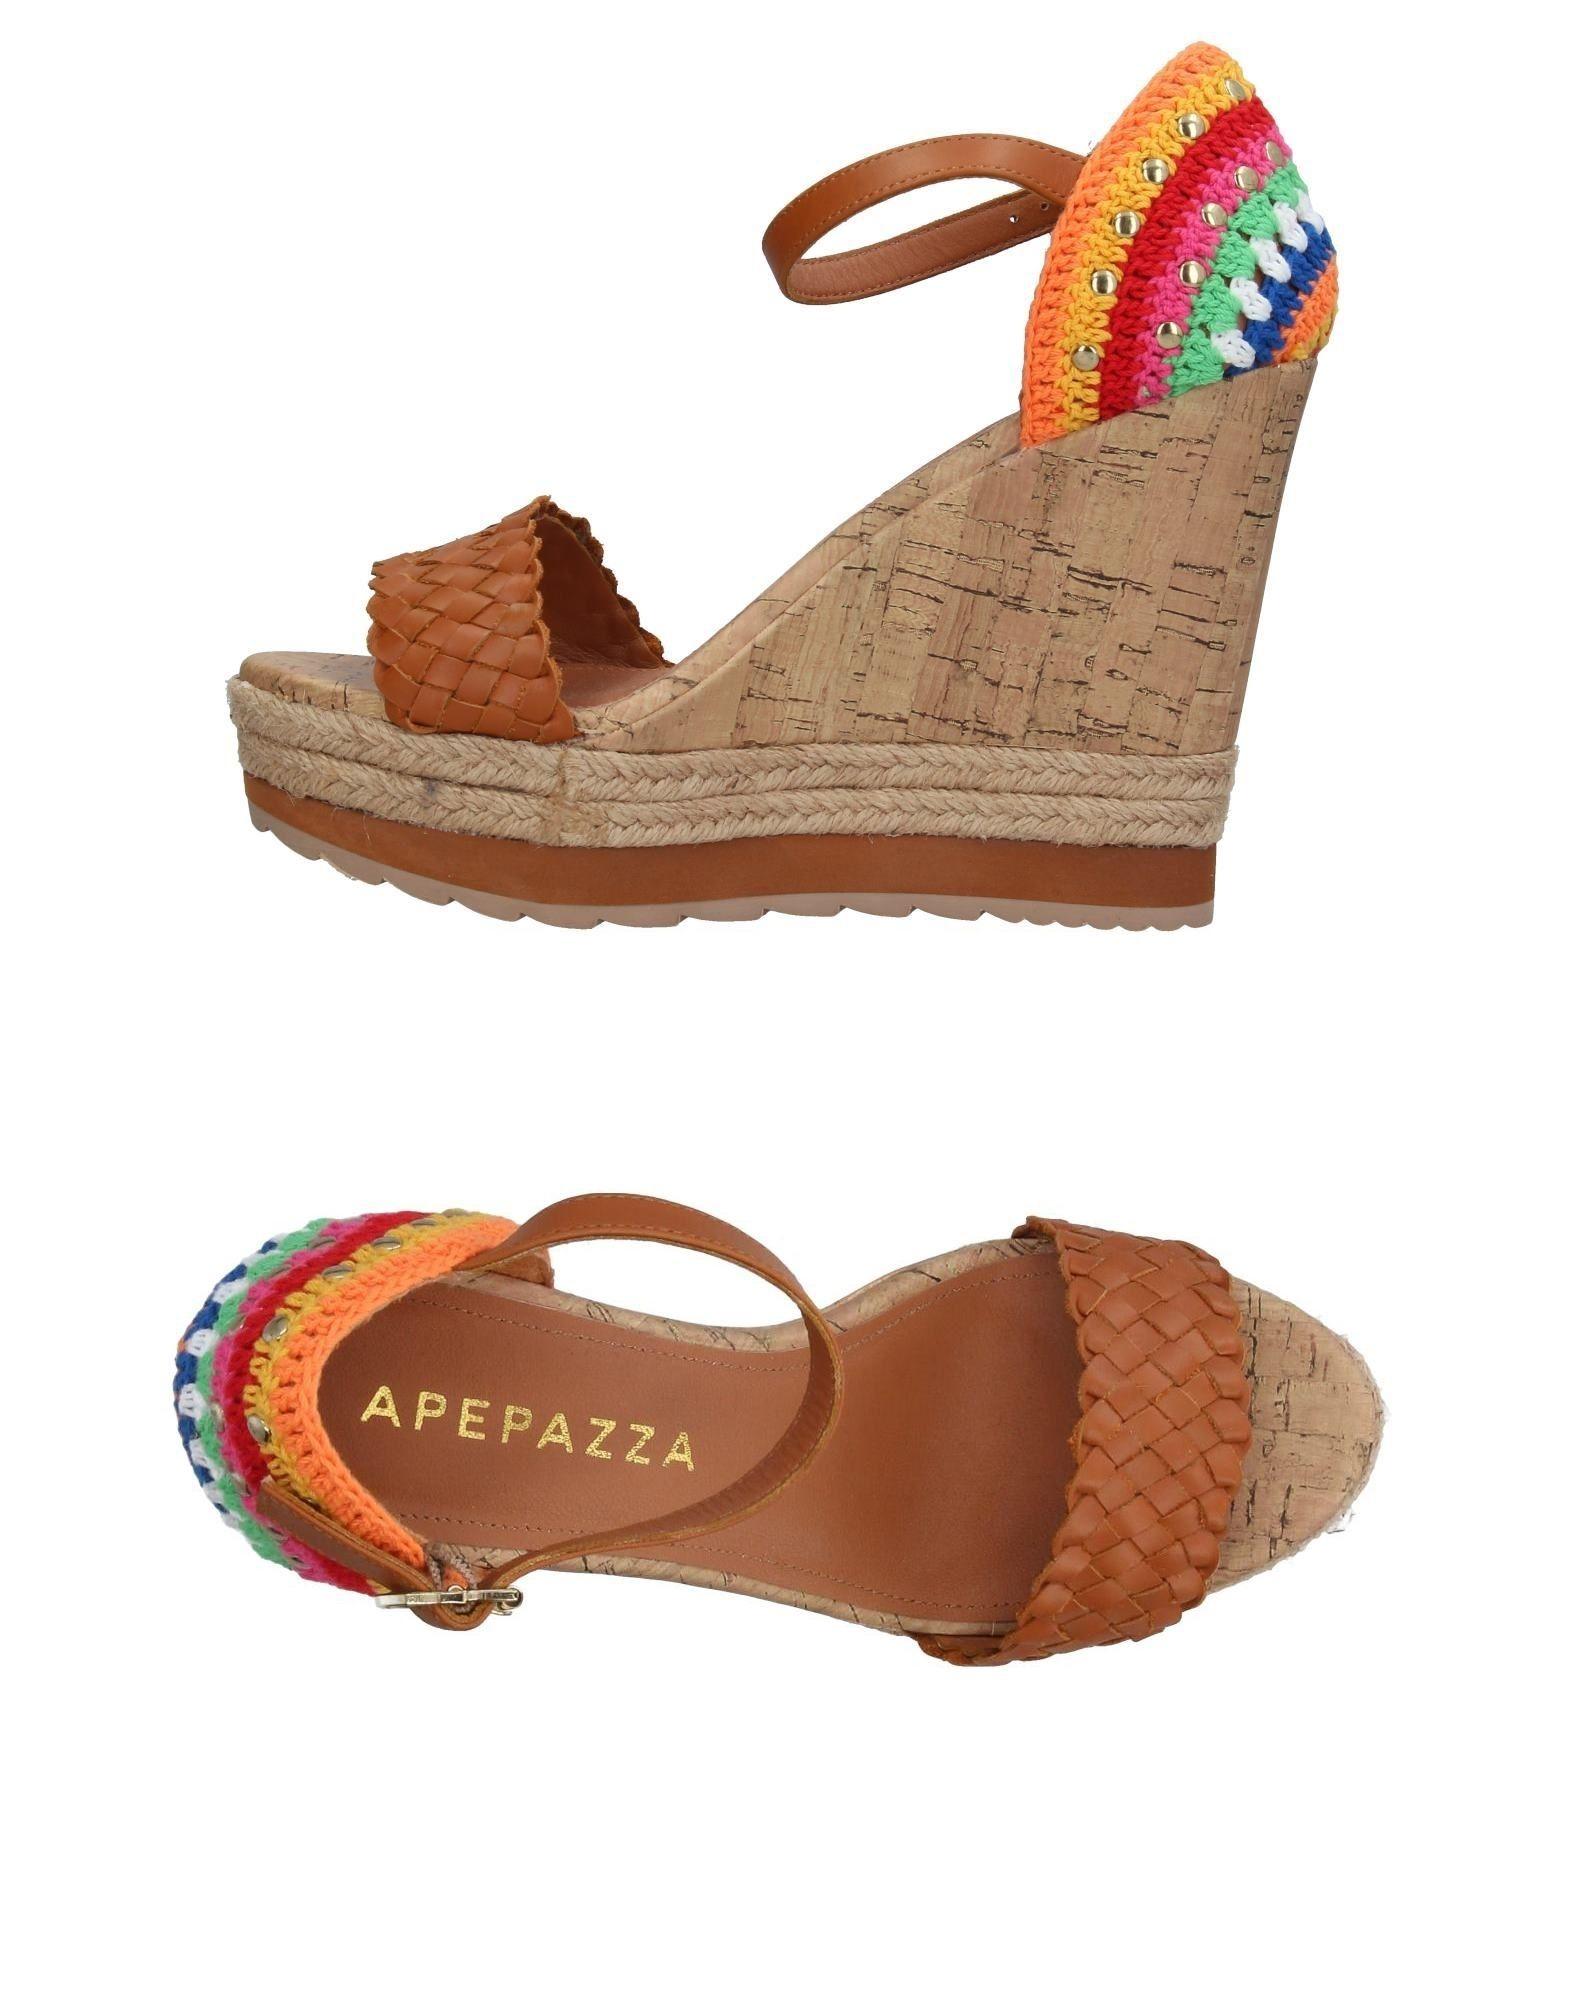 Apepazza Espadrilles Damen  11138444LM Gute Qualität beliebte Schuhe